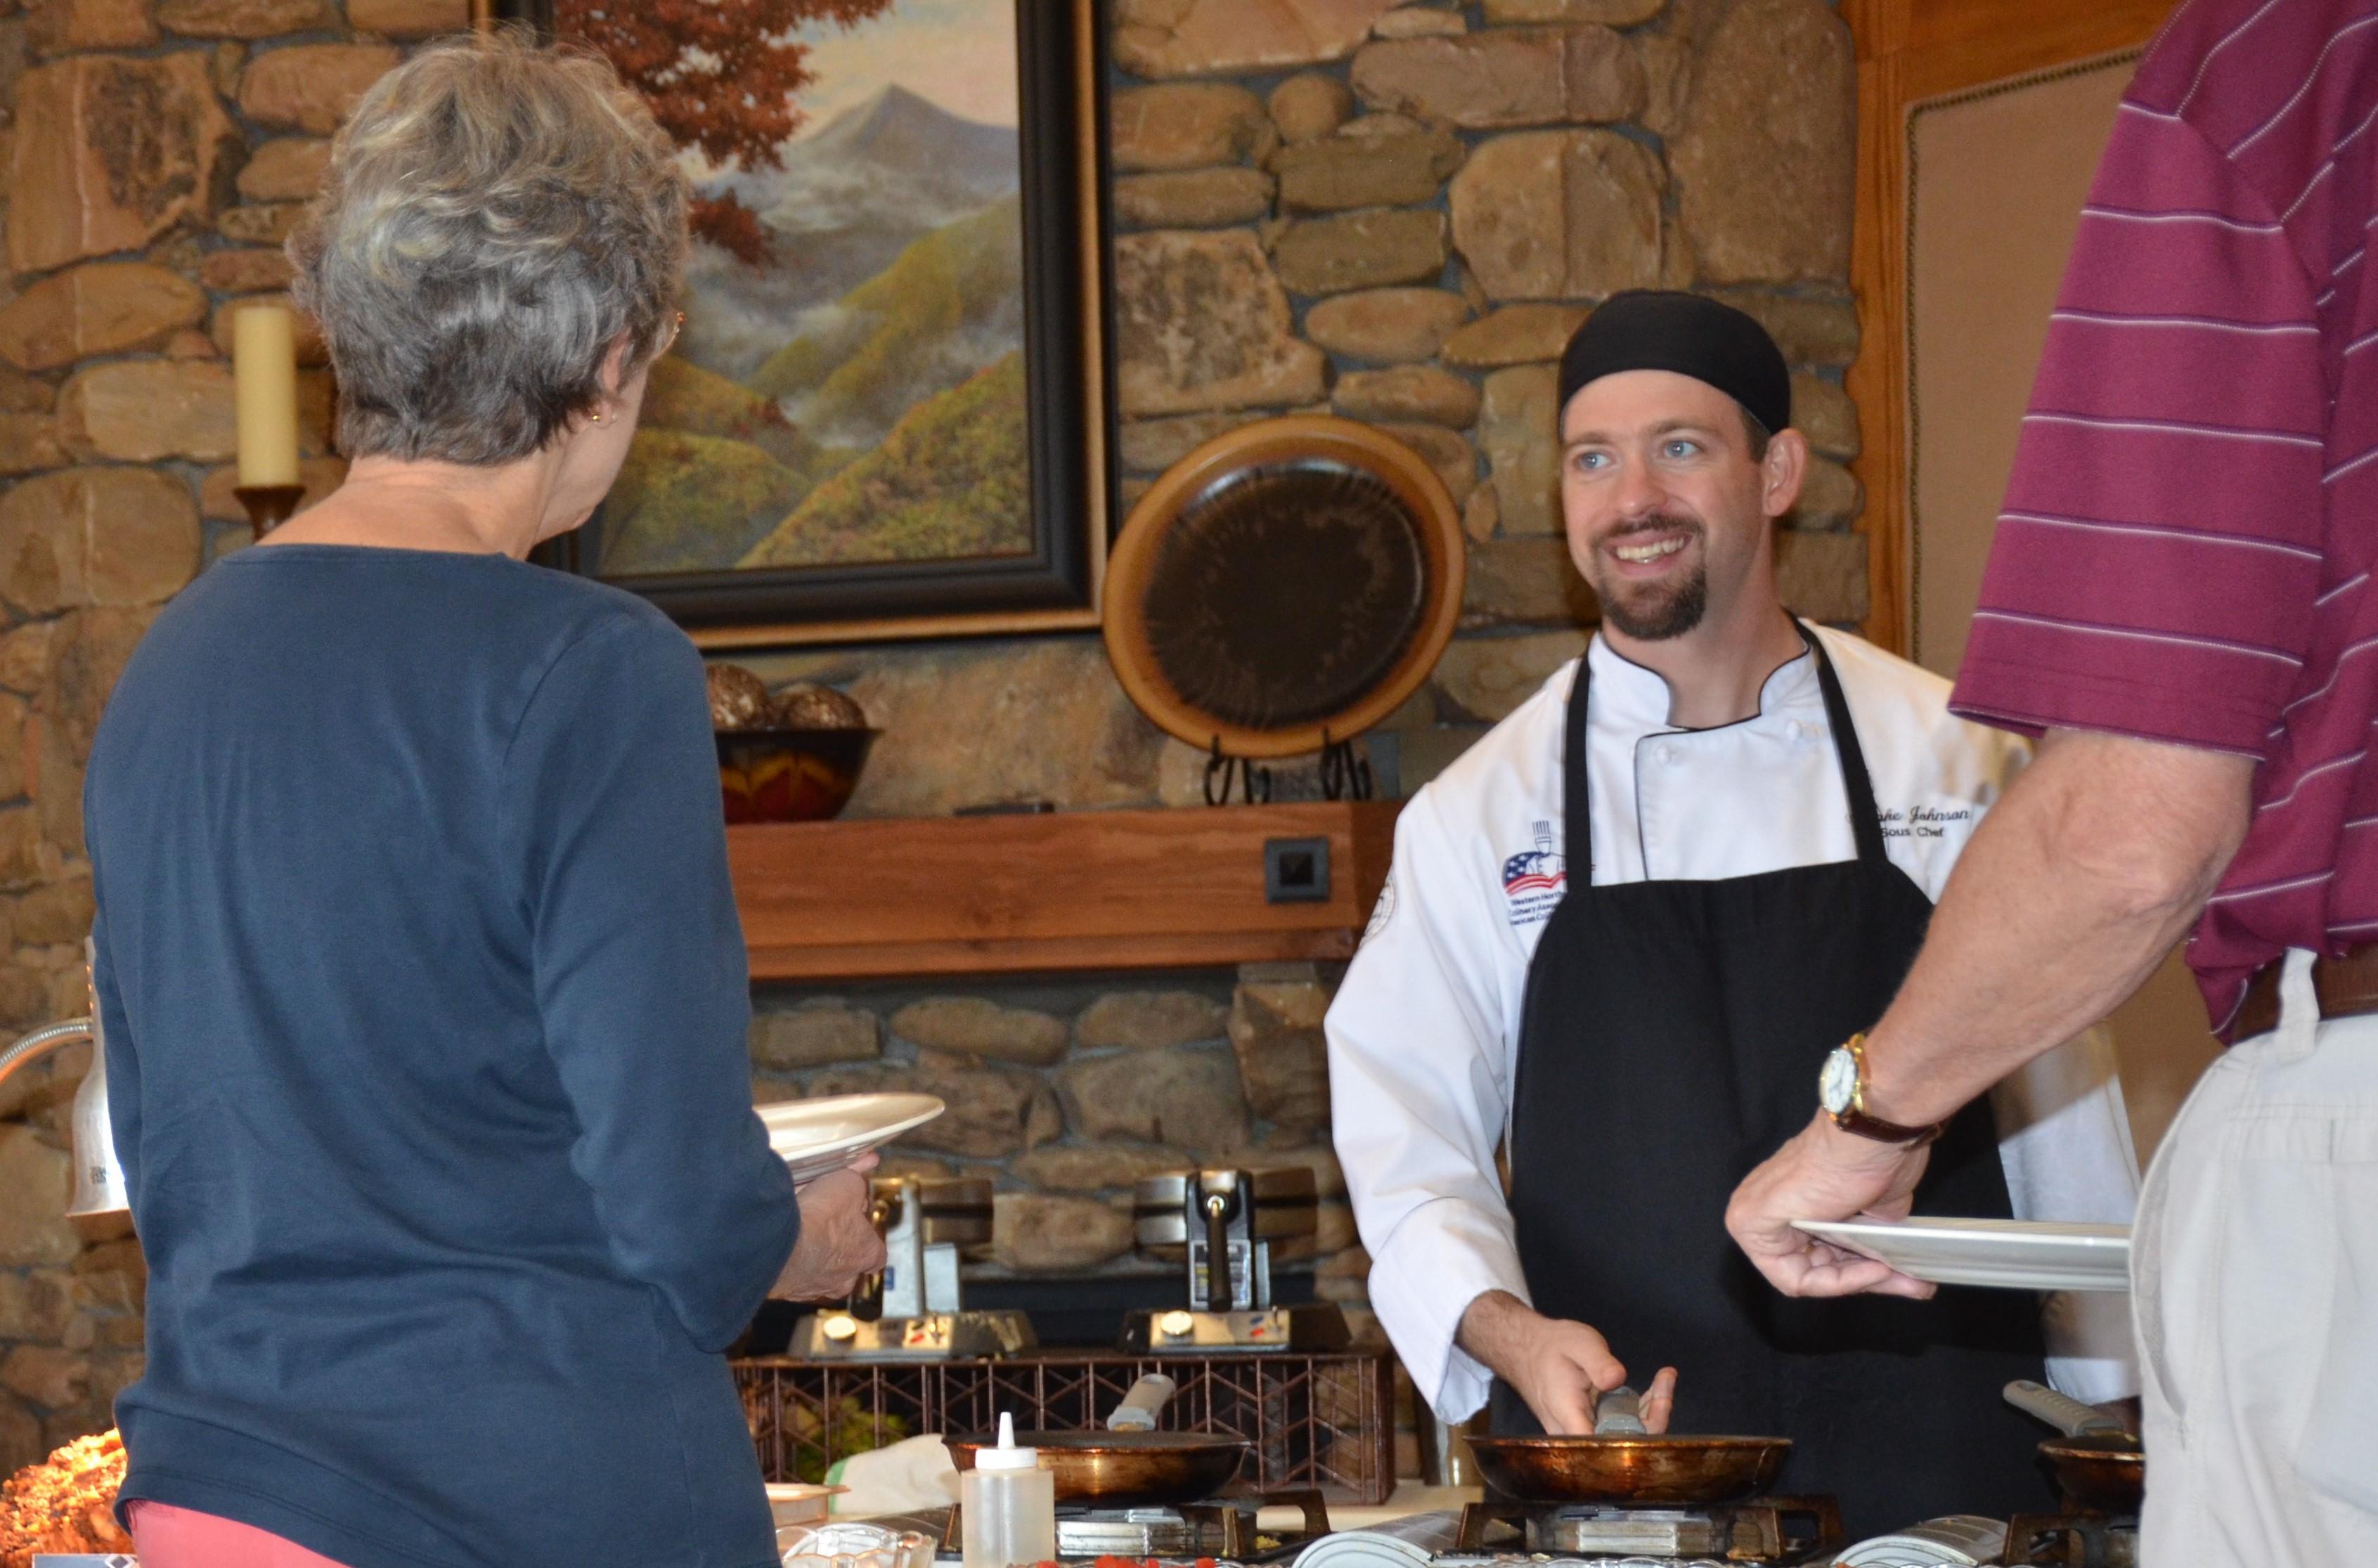 Blake Johnson Executive Chef at Champion Hills